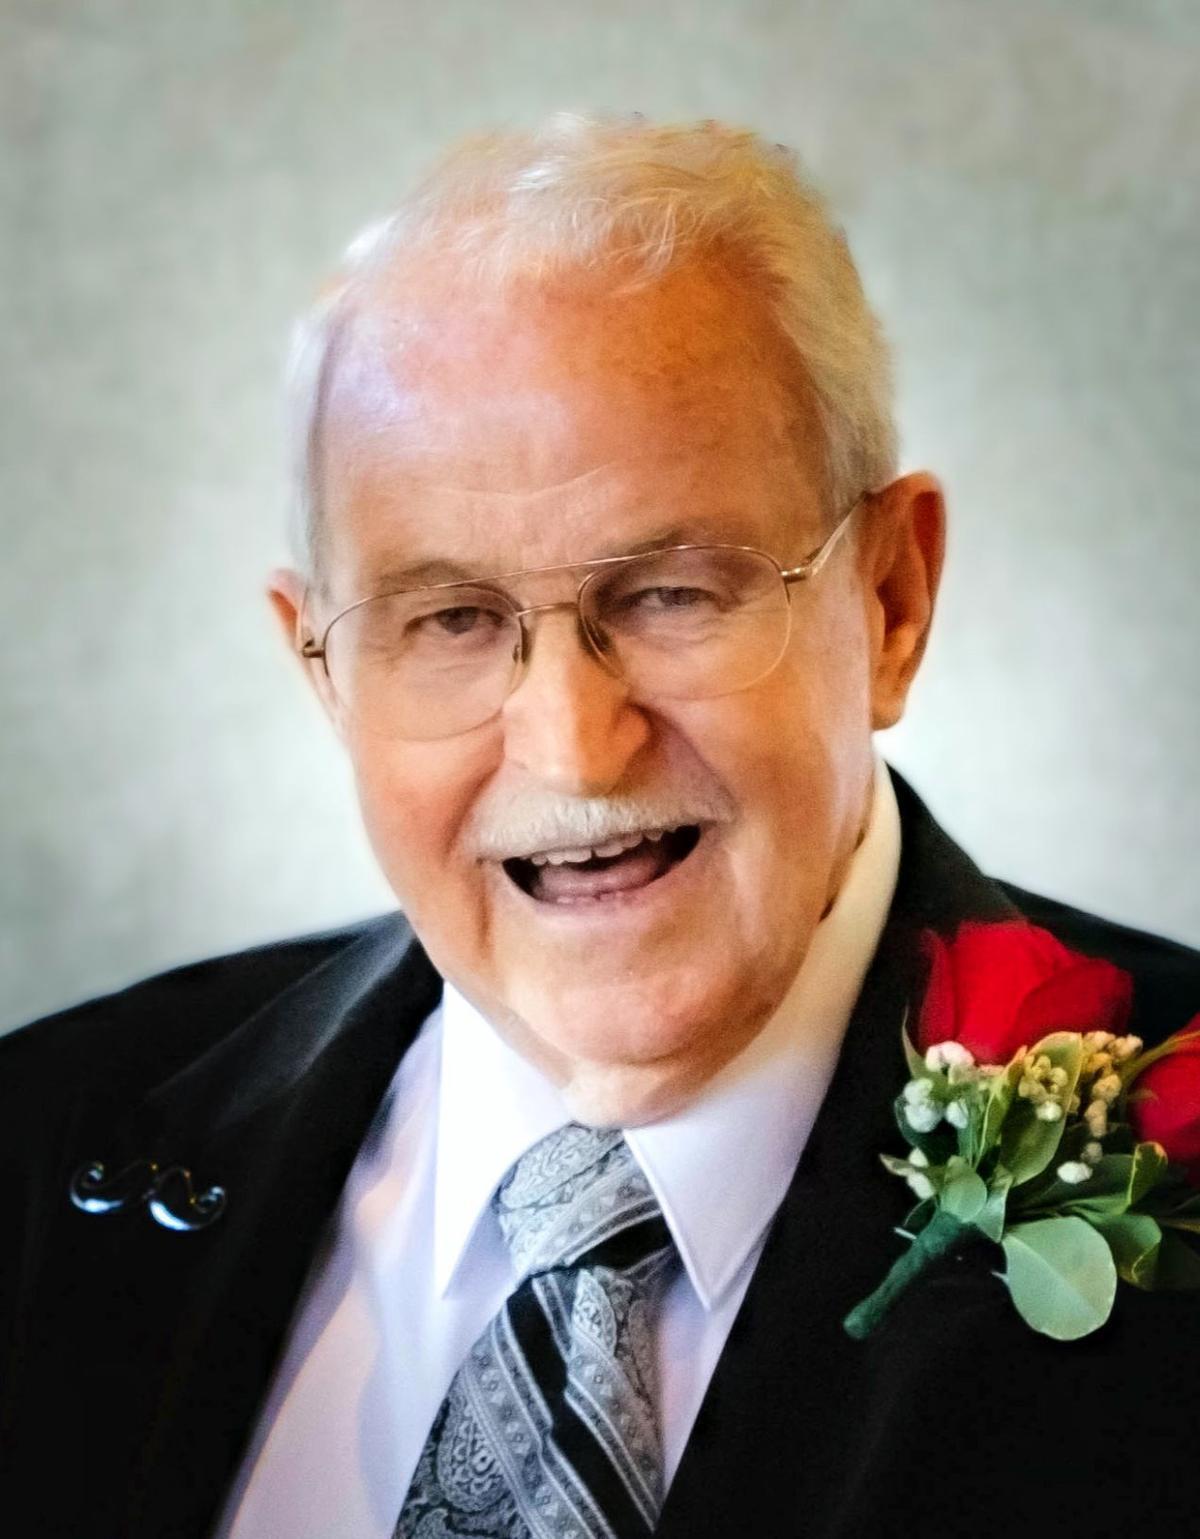 Harold Dean 'H.D.' McGhee